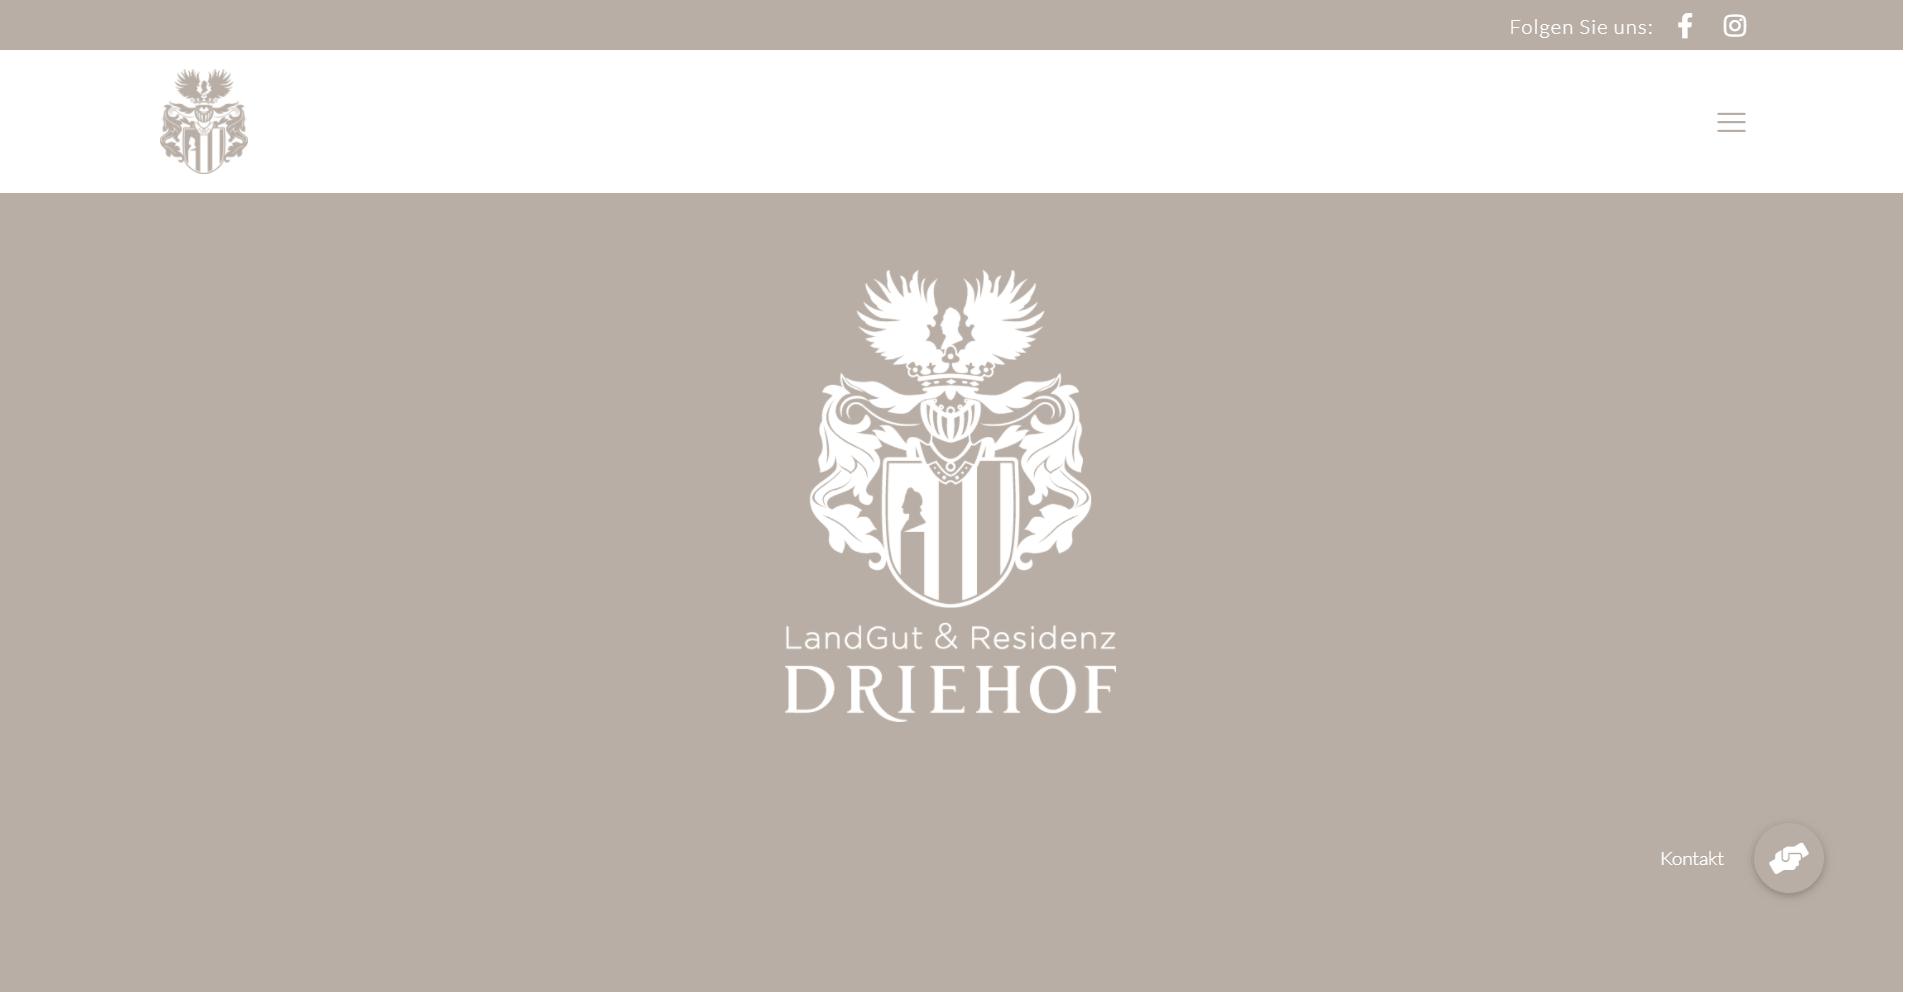 DRIEHOF, WordPress Webdesign Referenz